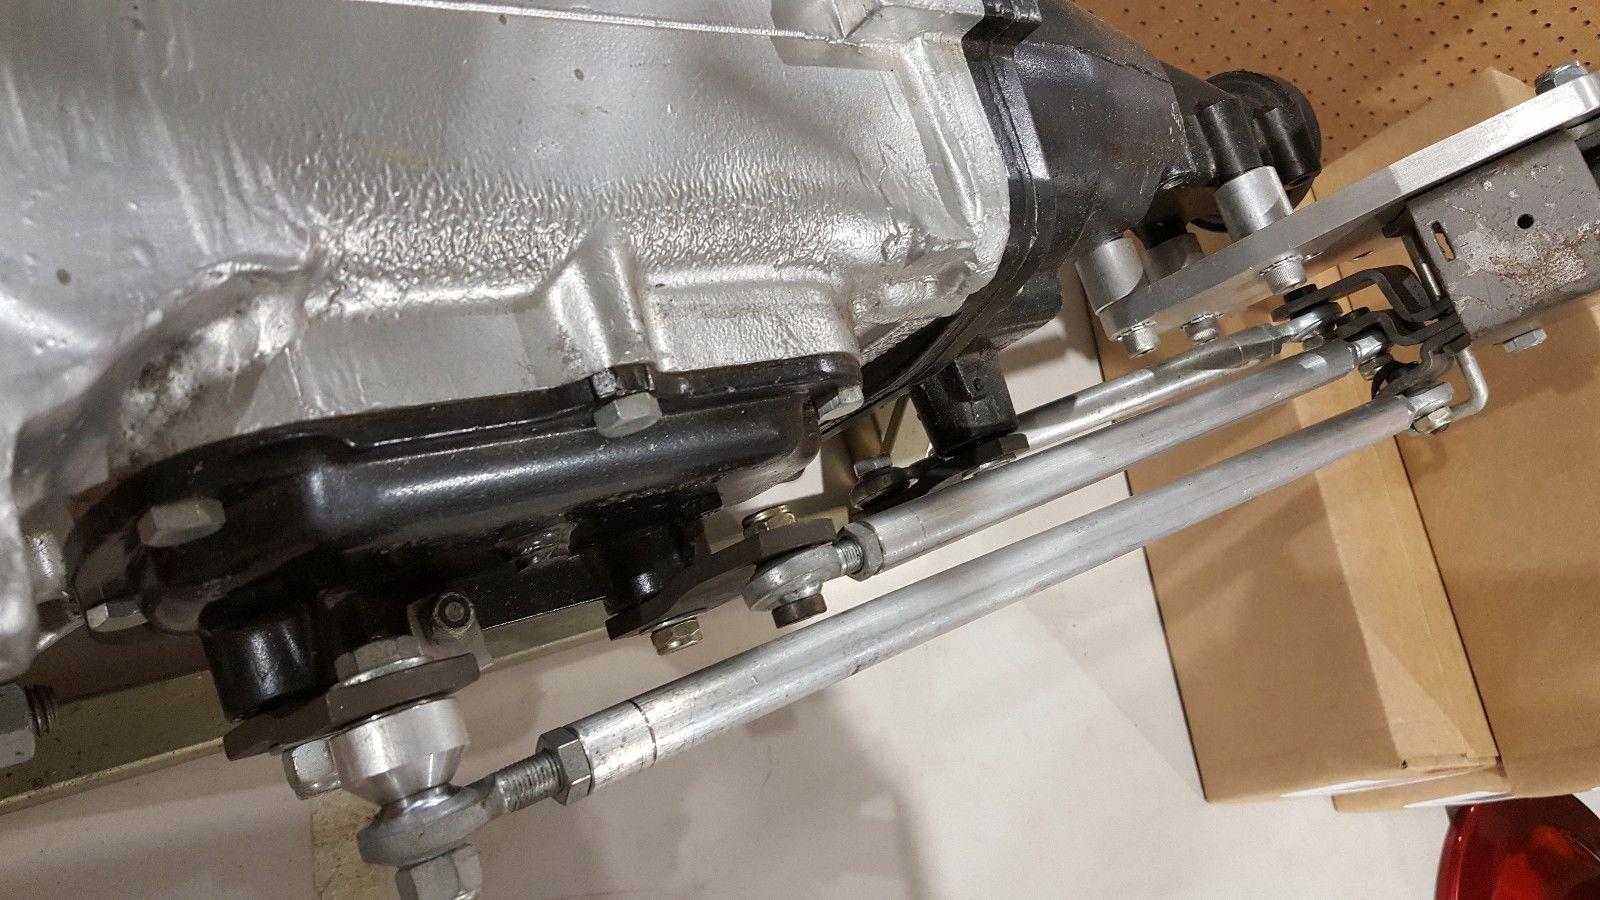 Details about All GM Camaro Corvette + Muncie 4 speed Hurst